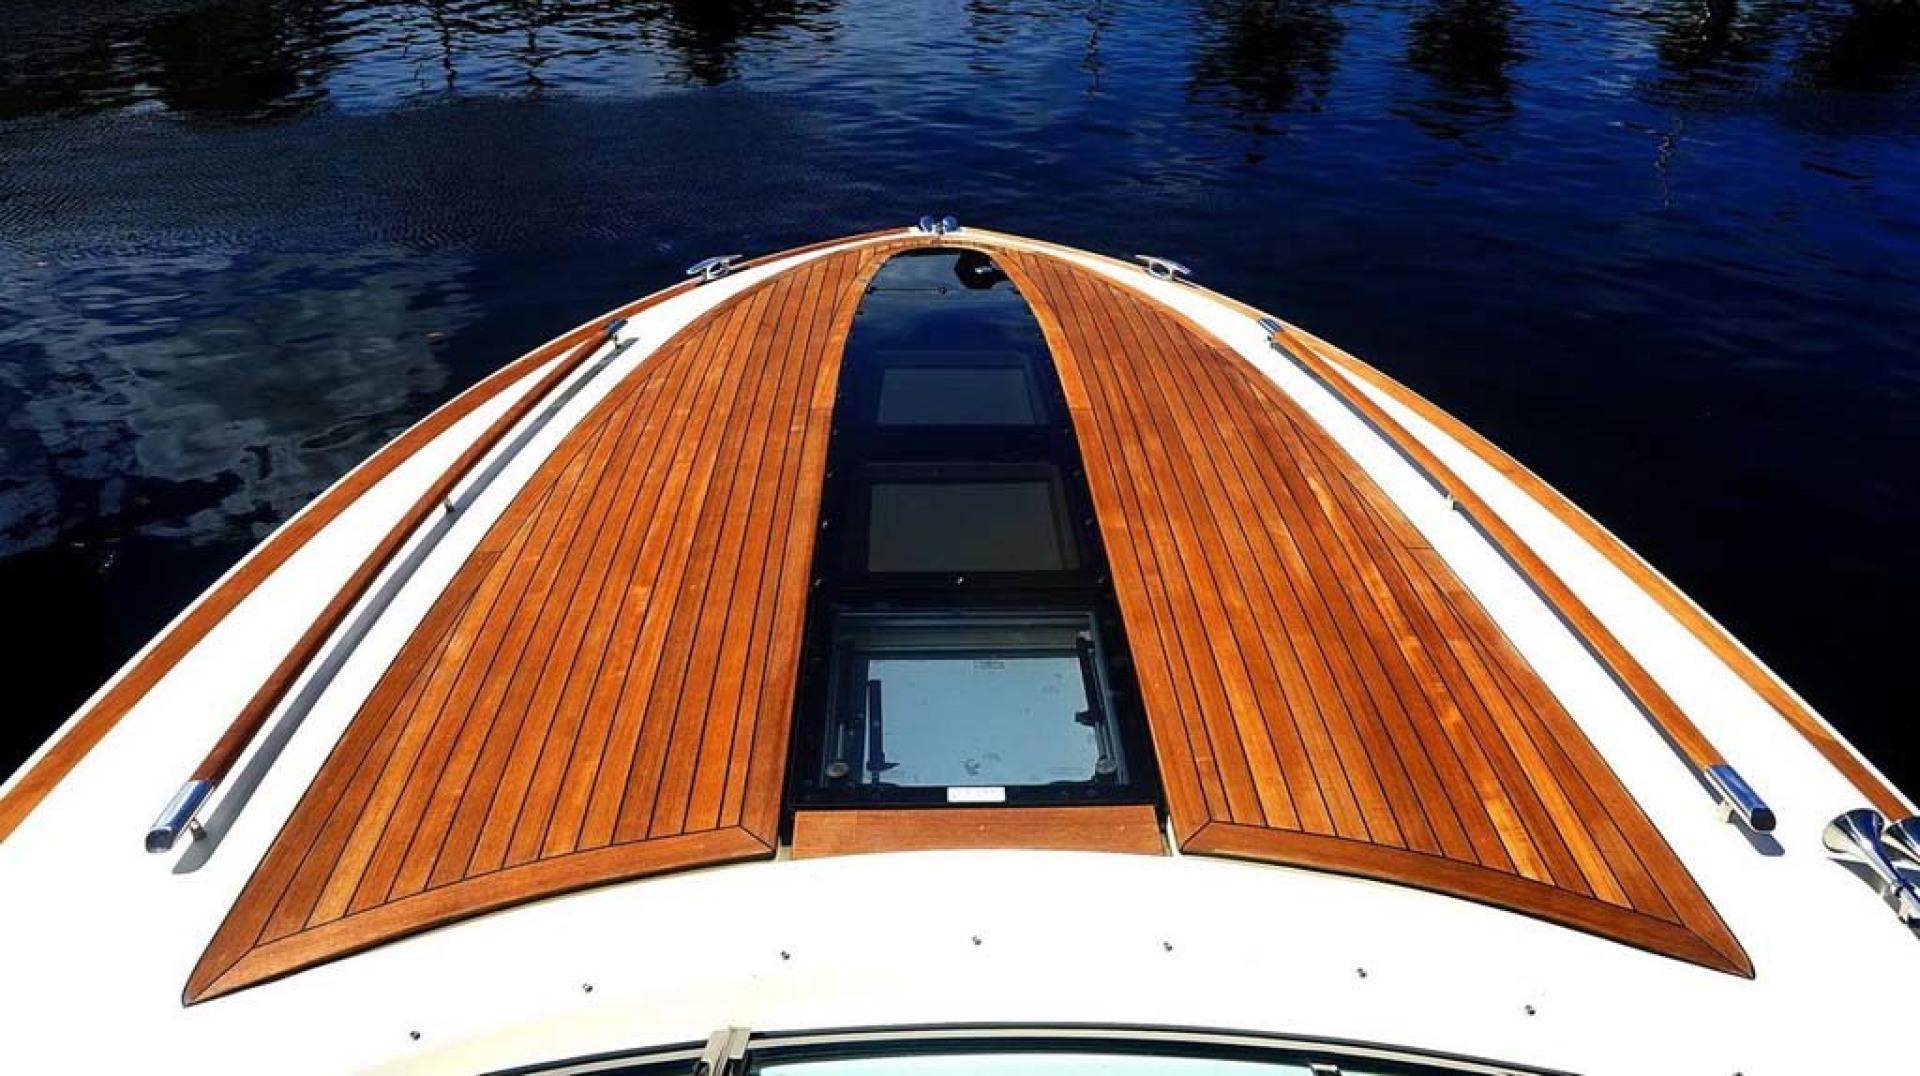 Chris-Craft-Corsair 36 2013-La Dolce Vita Fort Lauderdale-Florida-United States-Foredeck-1074563 | Thumbnail